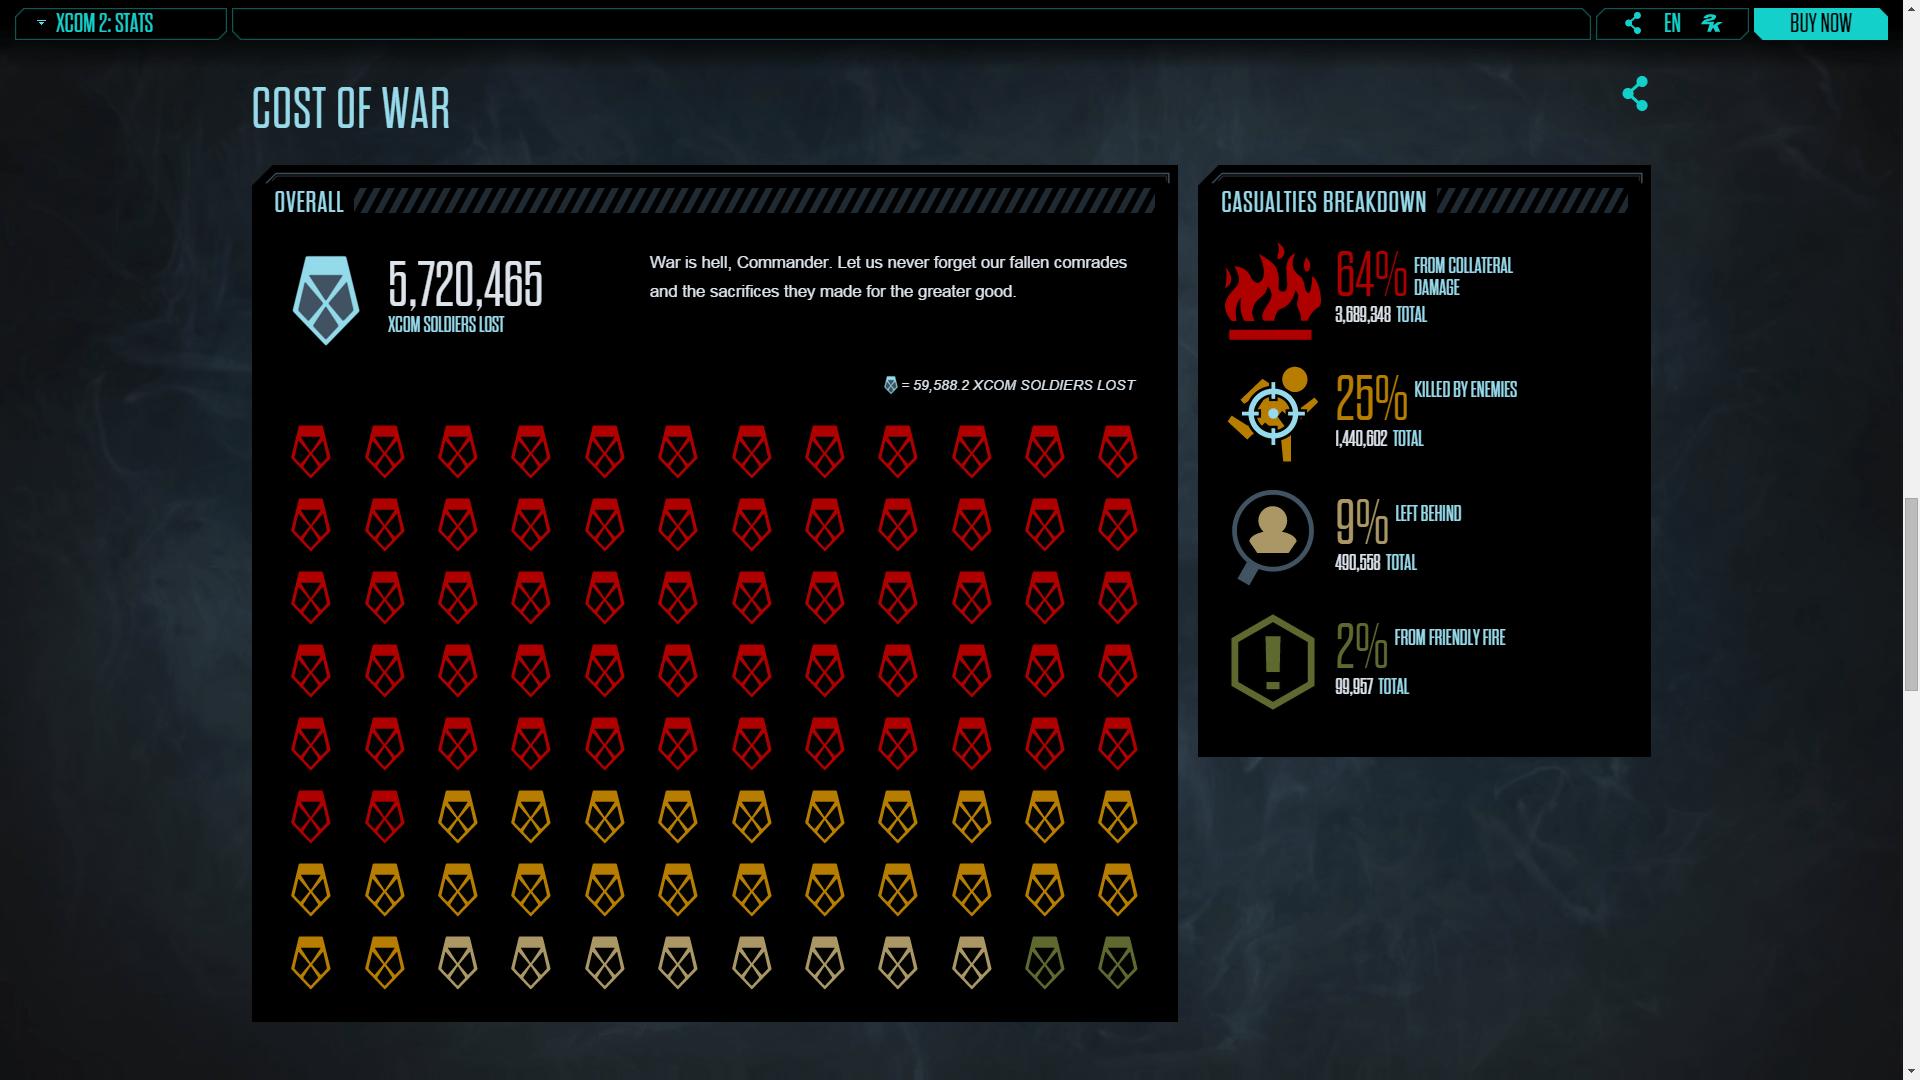 xcom stats page